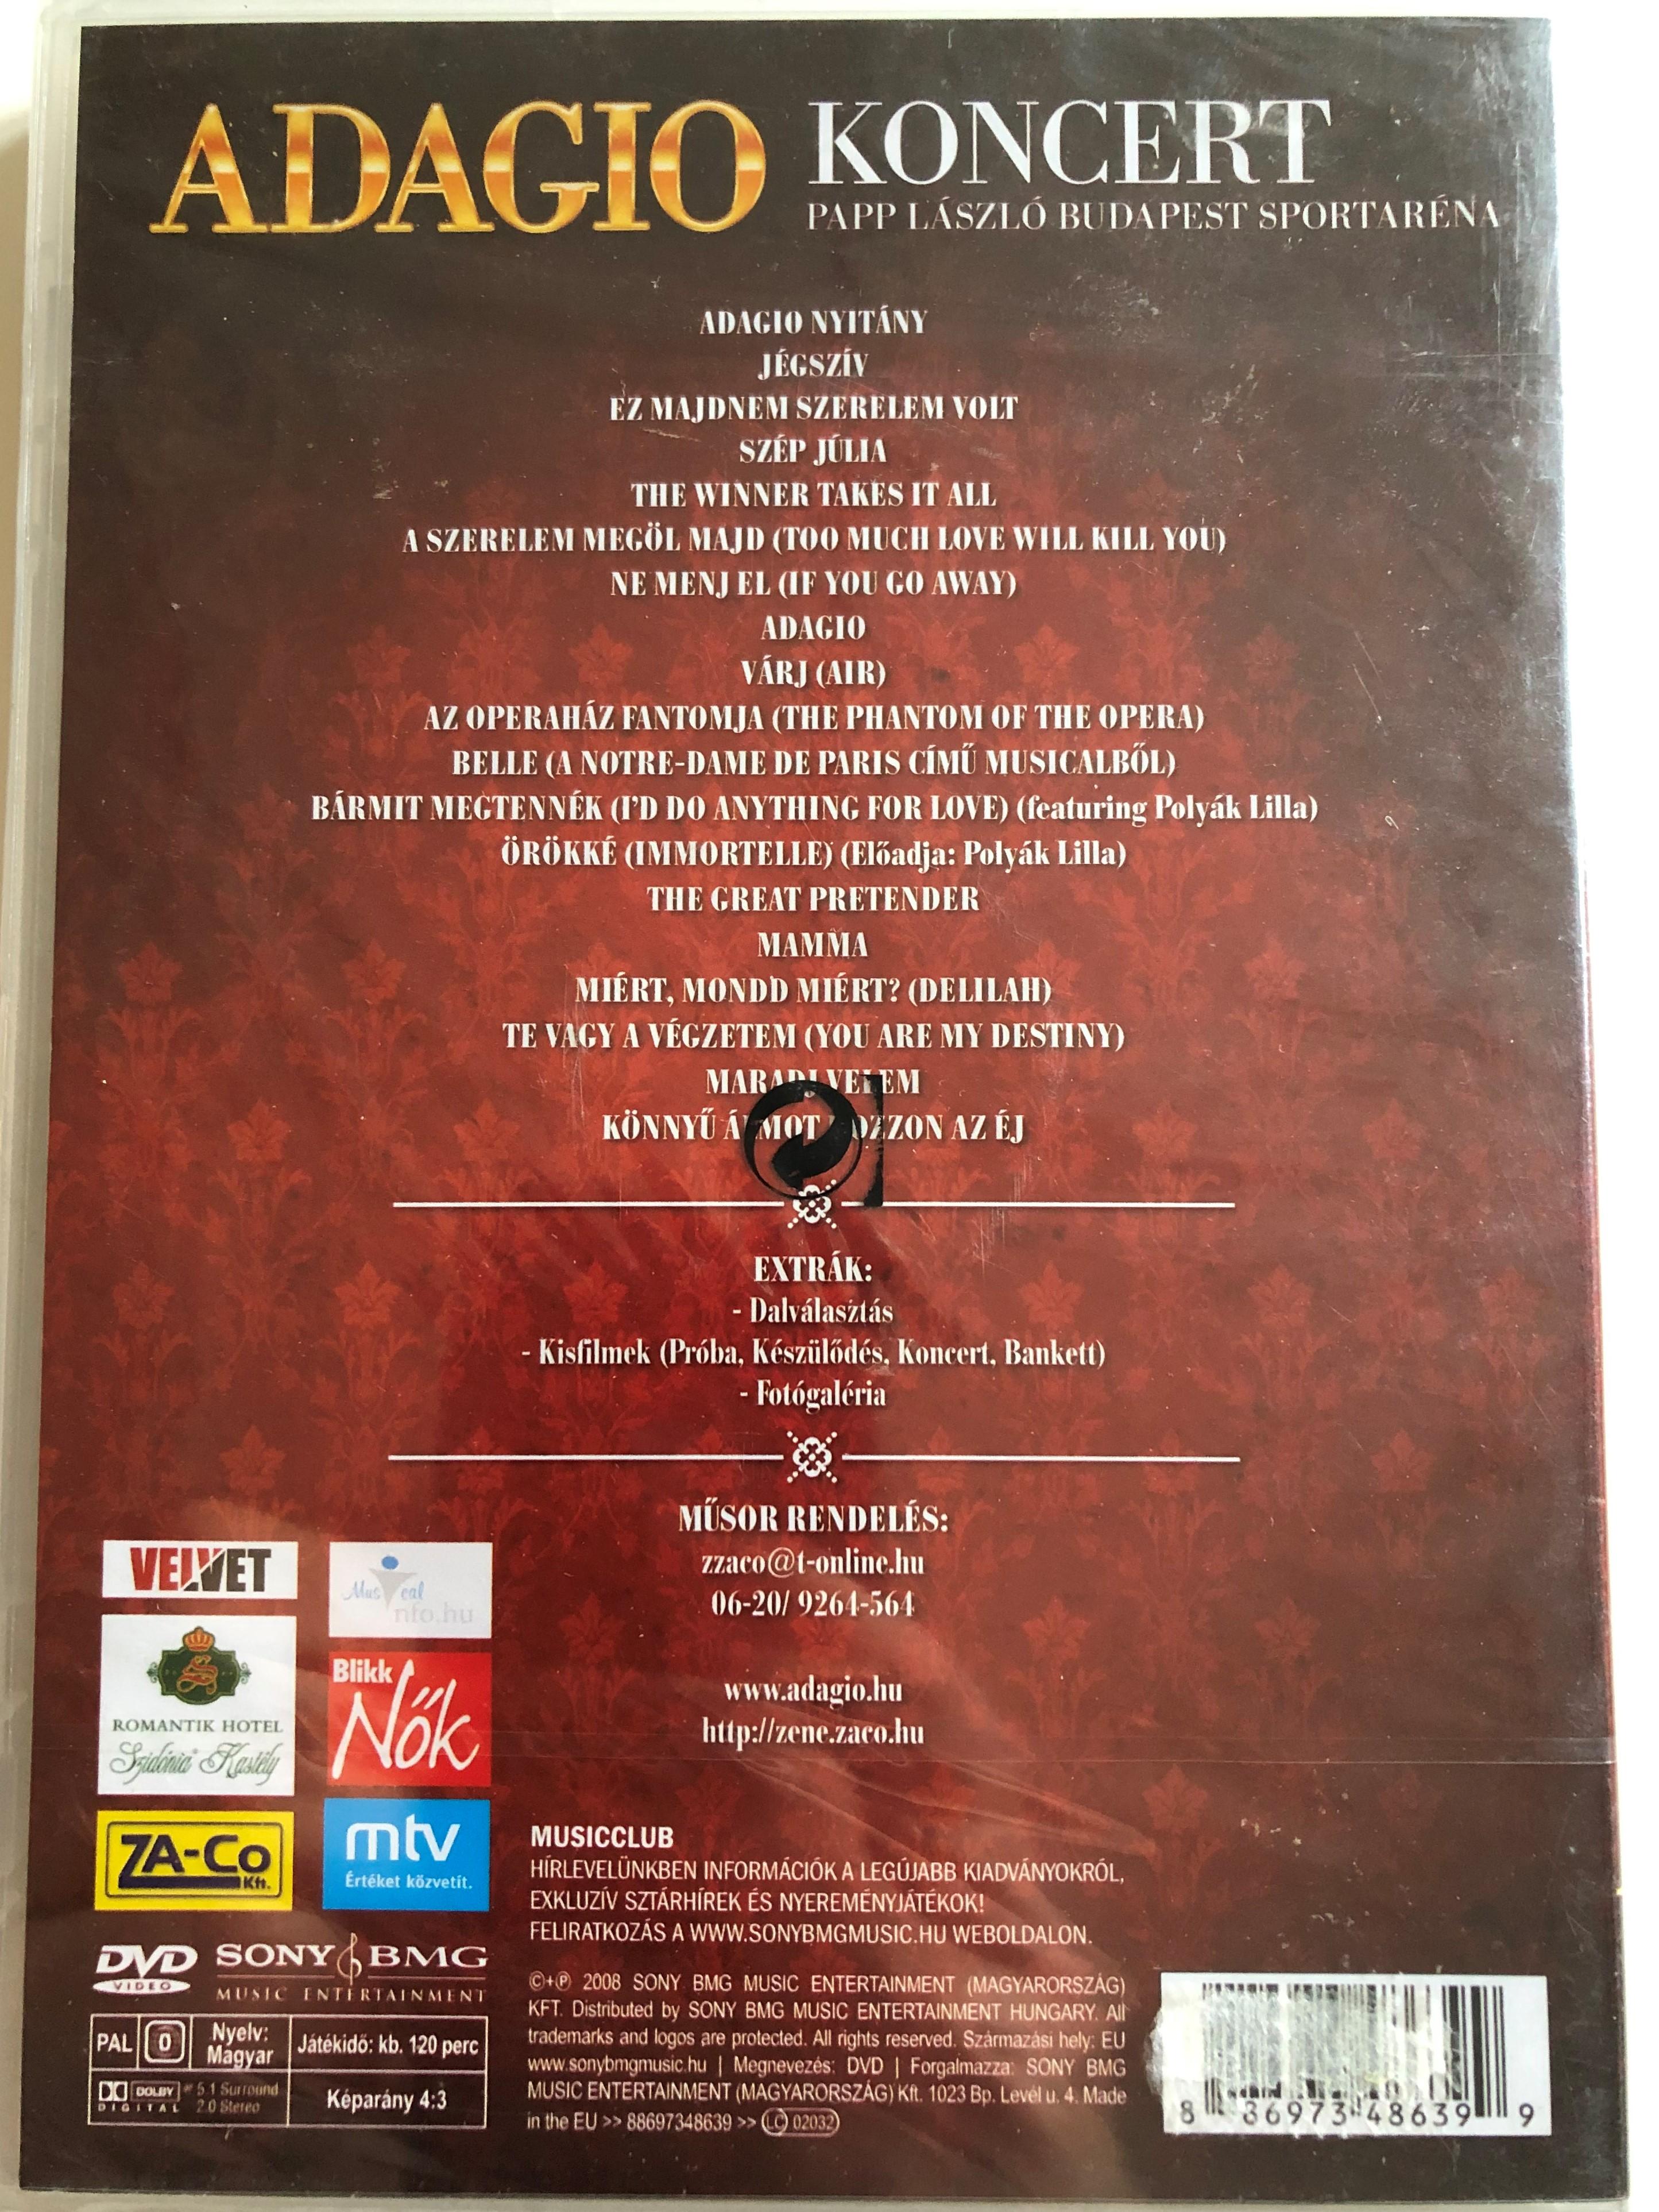 adagio-koncert-dvd-2008-papp-l-szl-budapest-sportar-na-2.jpg